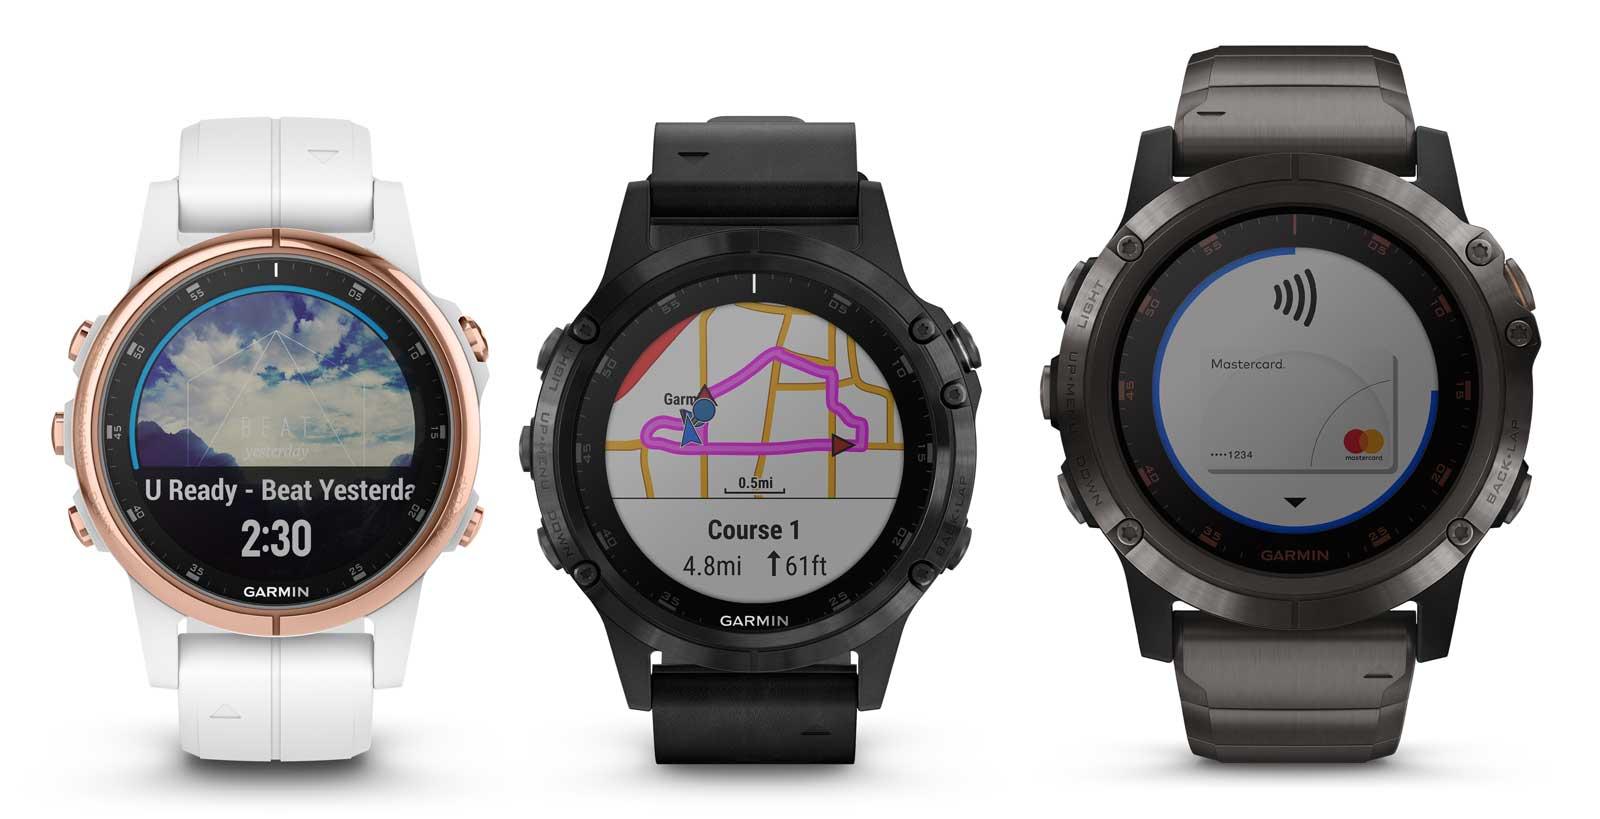 Garmin S Fenix 5 Plus Watches Help You Survive Mountain Climbing